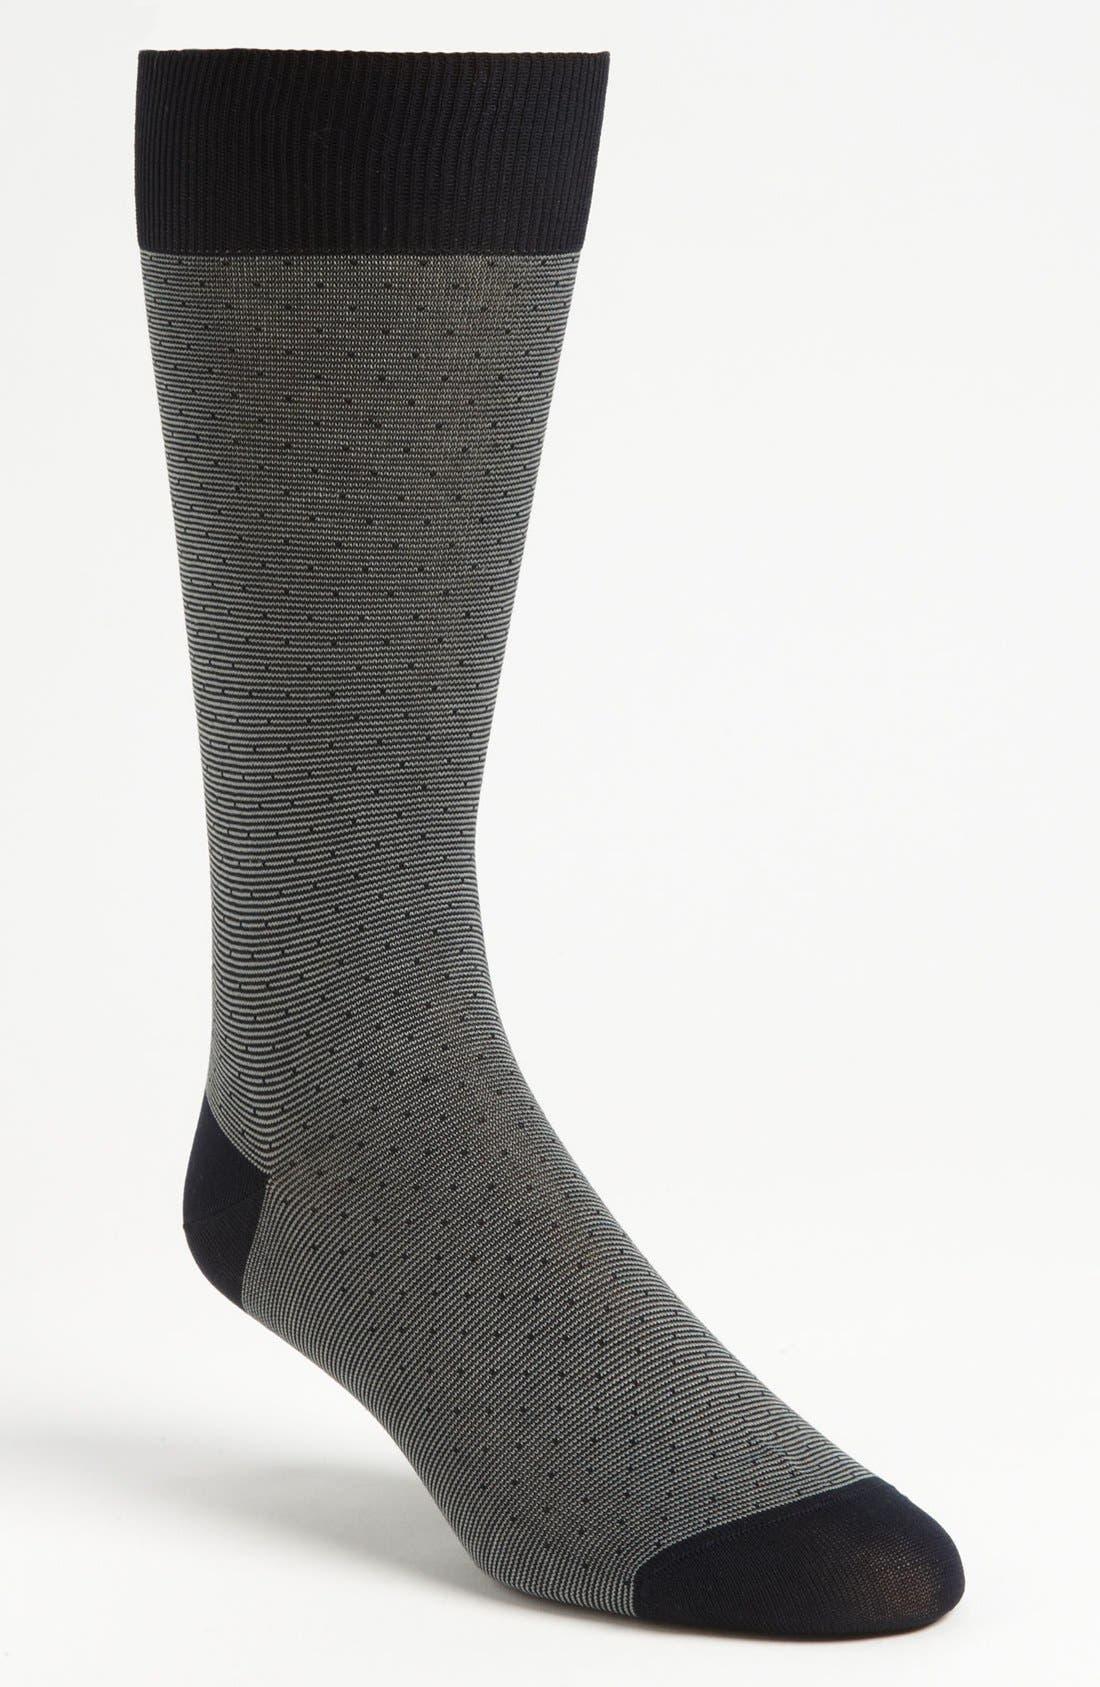 Alternate Image 1 Selected - Pantherella 'Mayfair' Stripe Socks